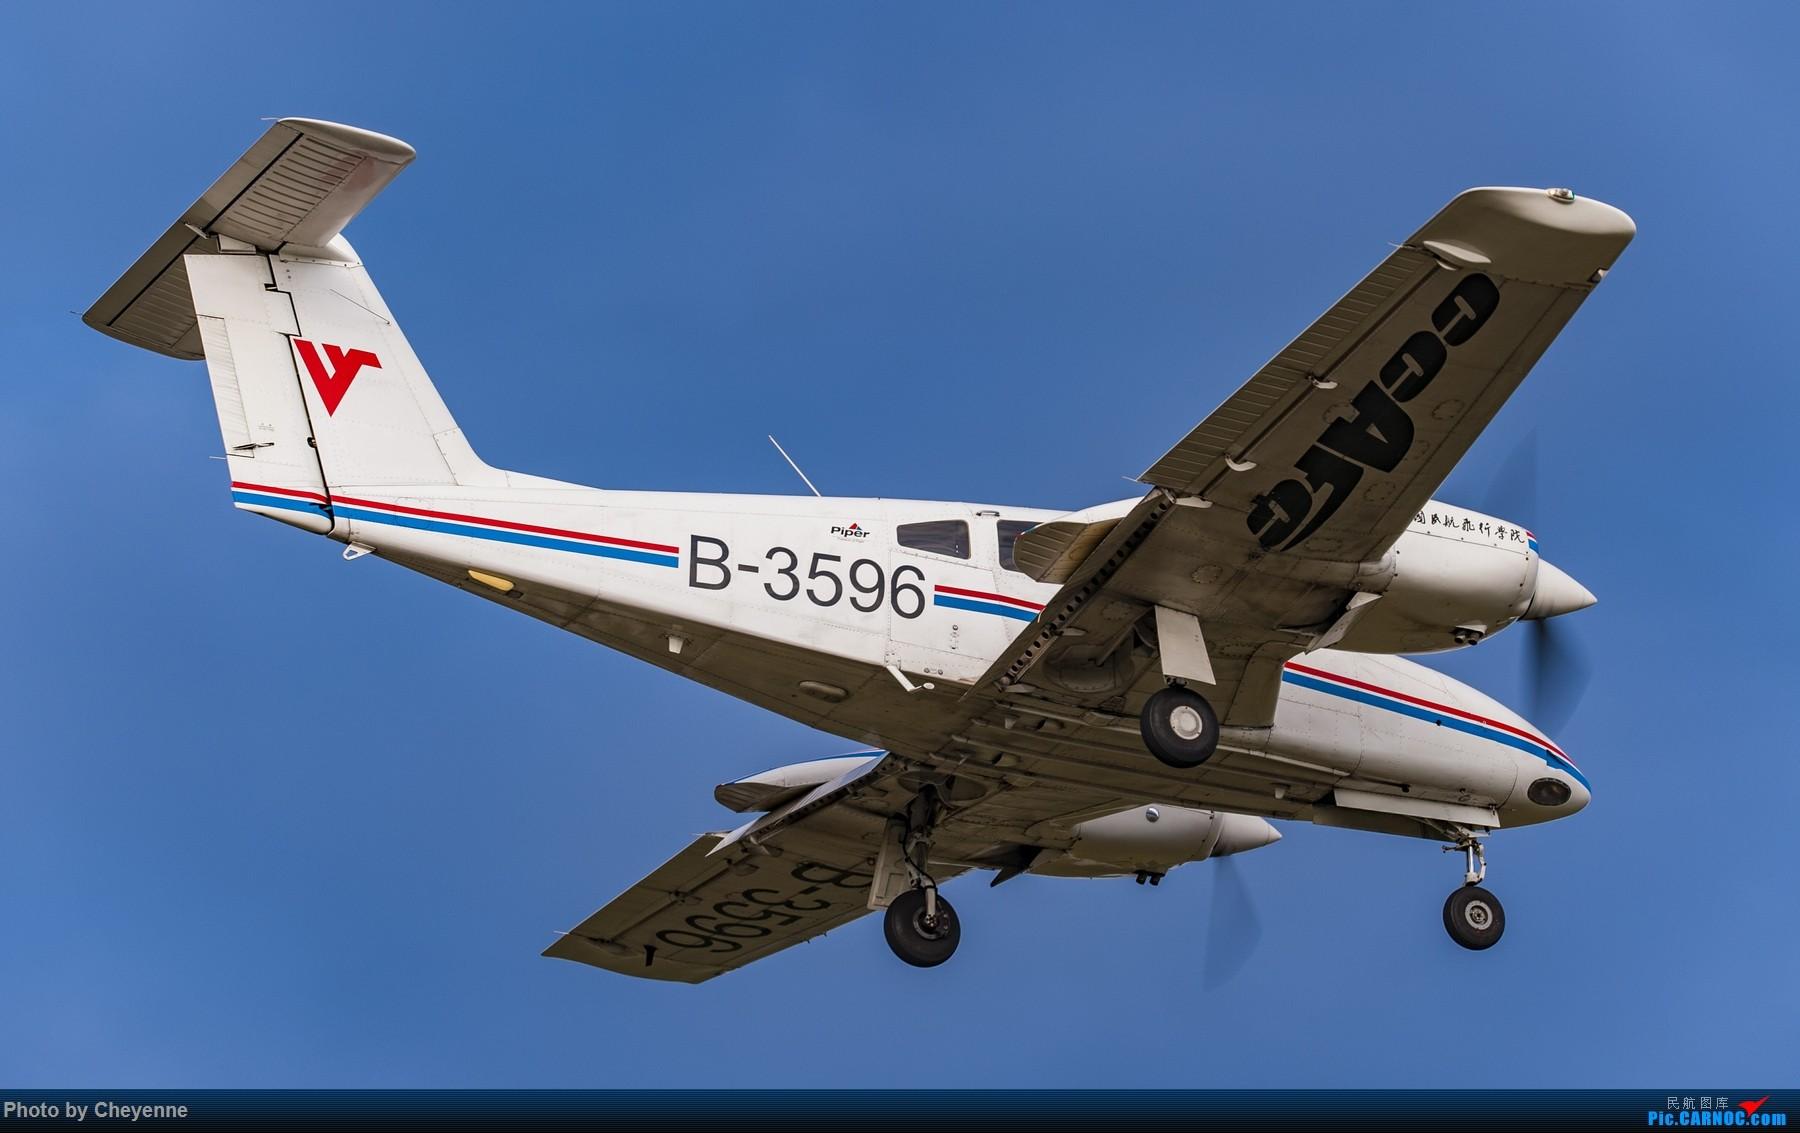 Re:[原创]【GHN】短杵杵脚杆些 PIPER PA-44-180 B-3596 中国广汉机场